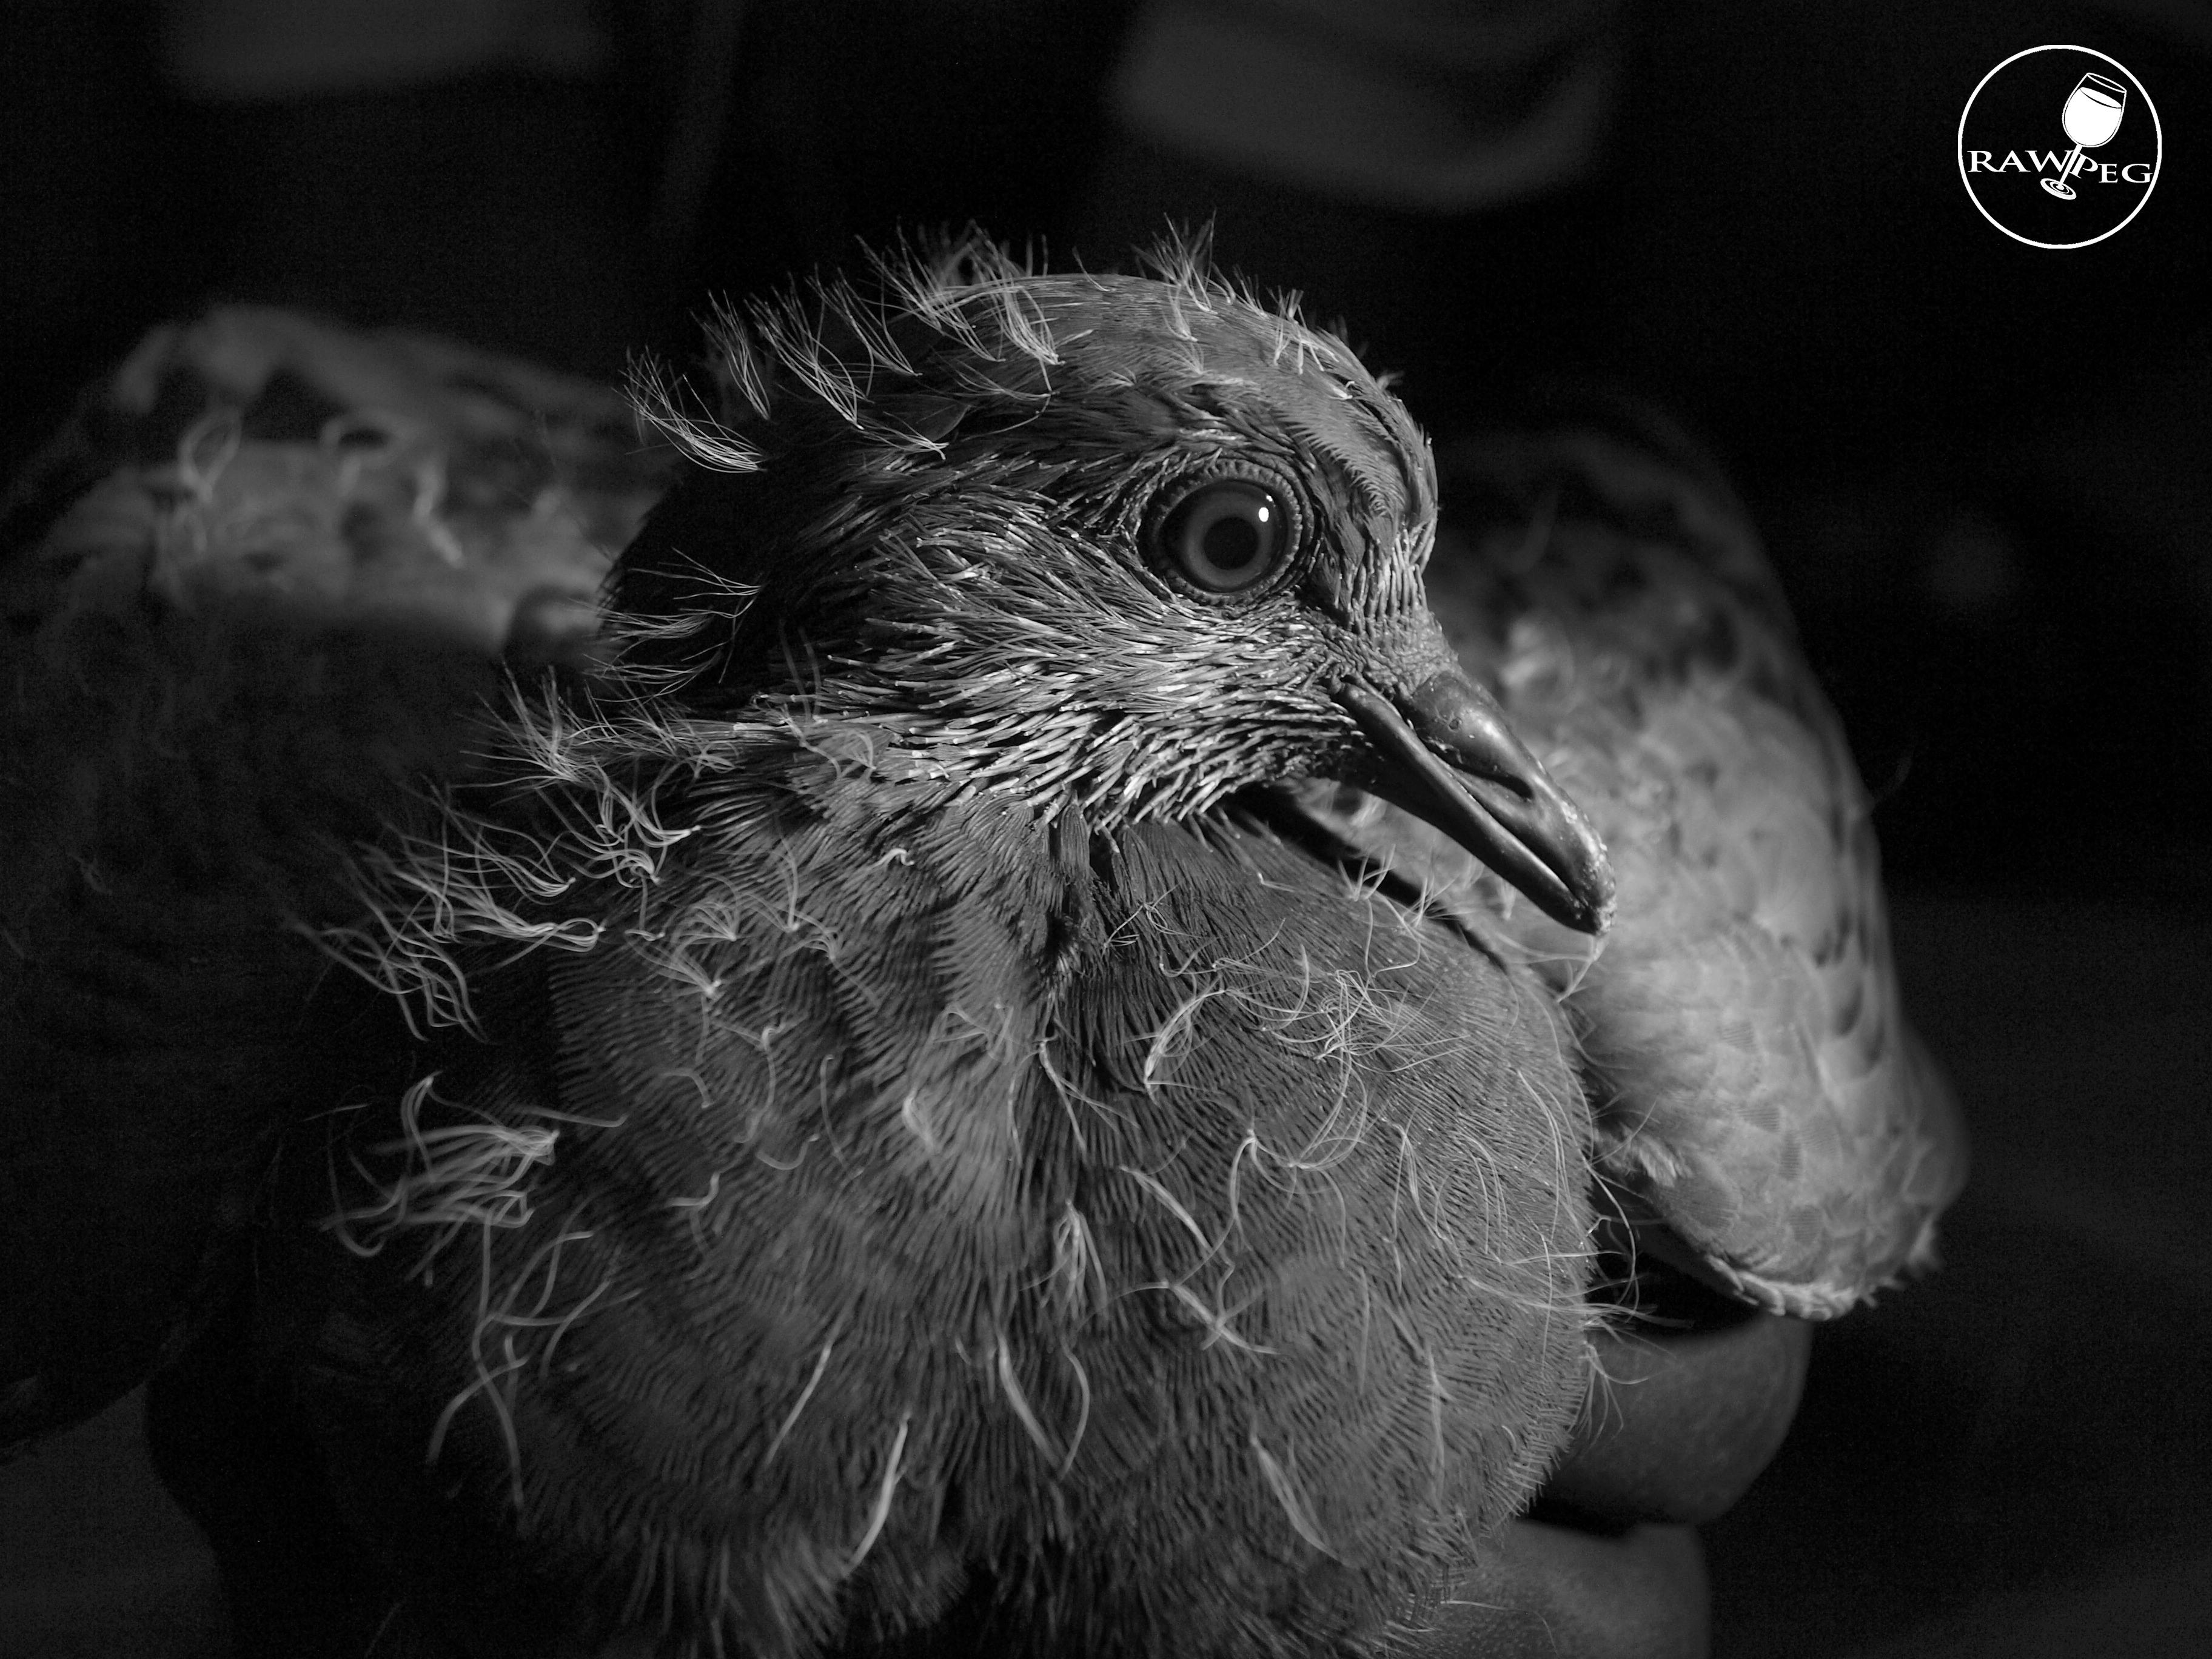 #rawpegstudio#bird#pigeon